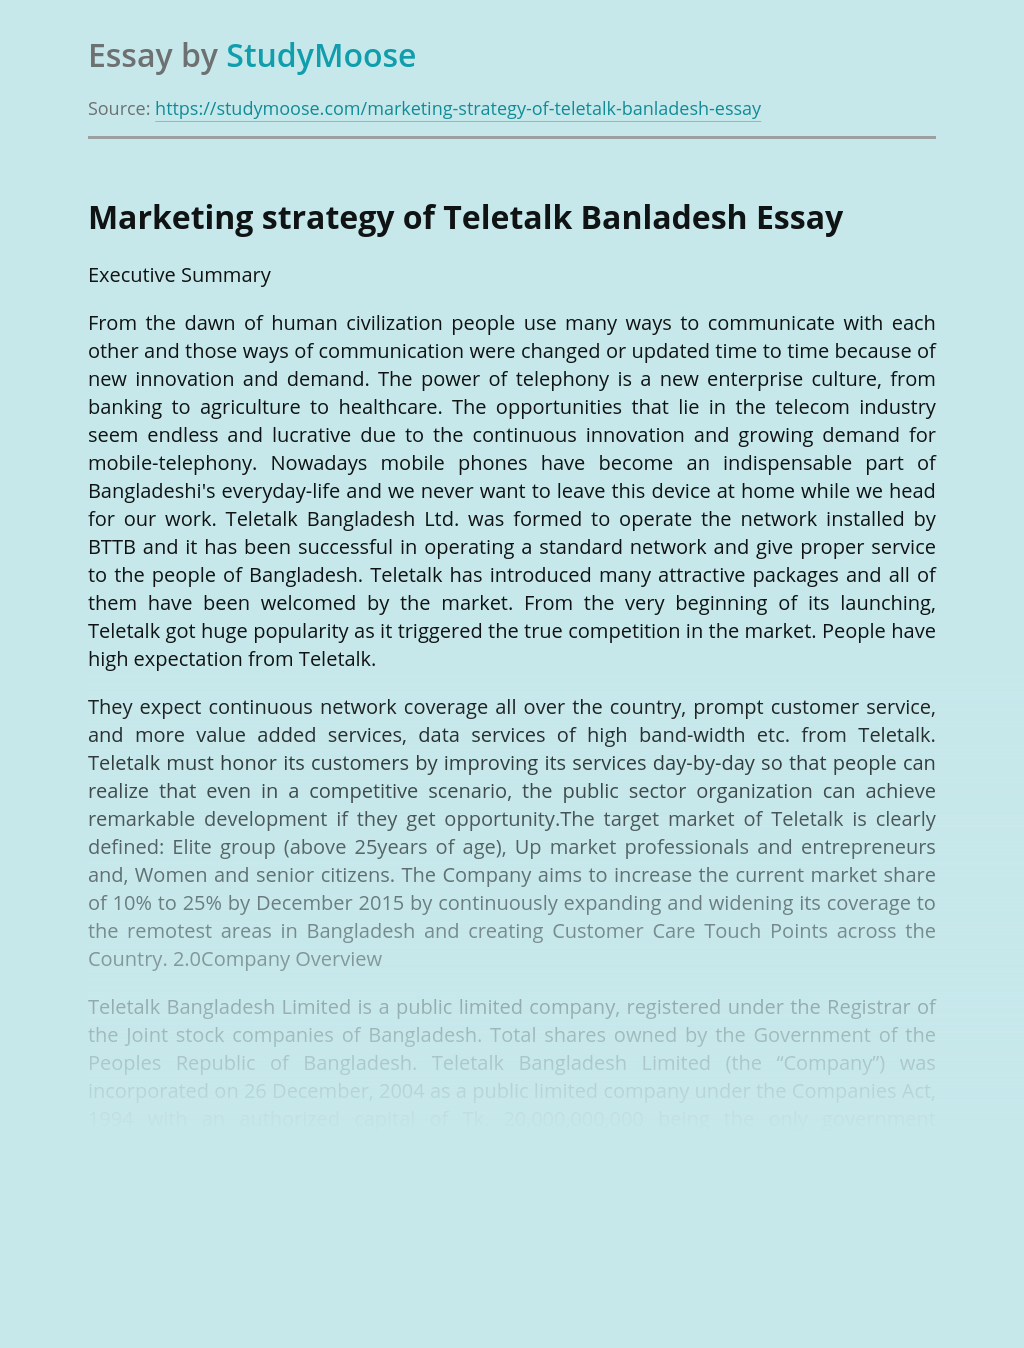 Marketing strategy of Teletalk Banladesh